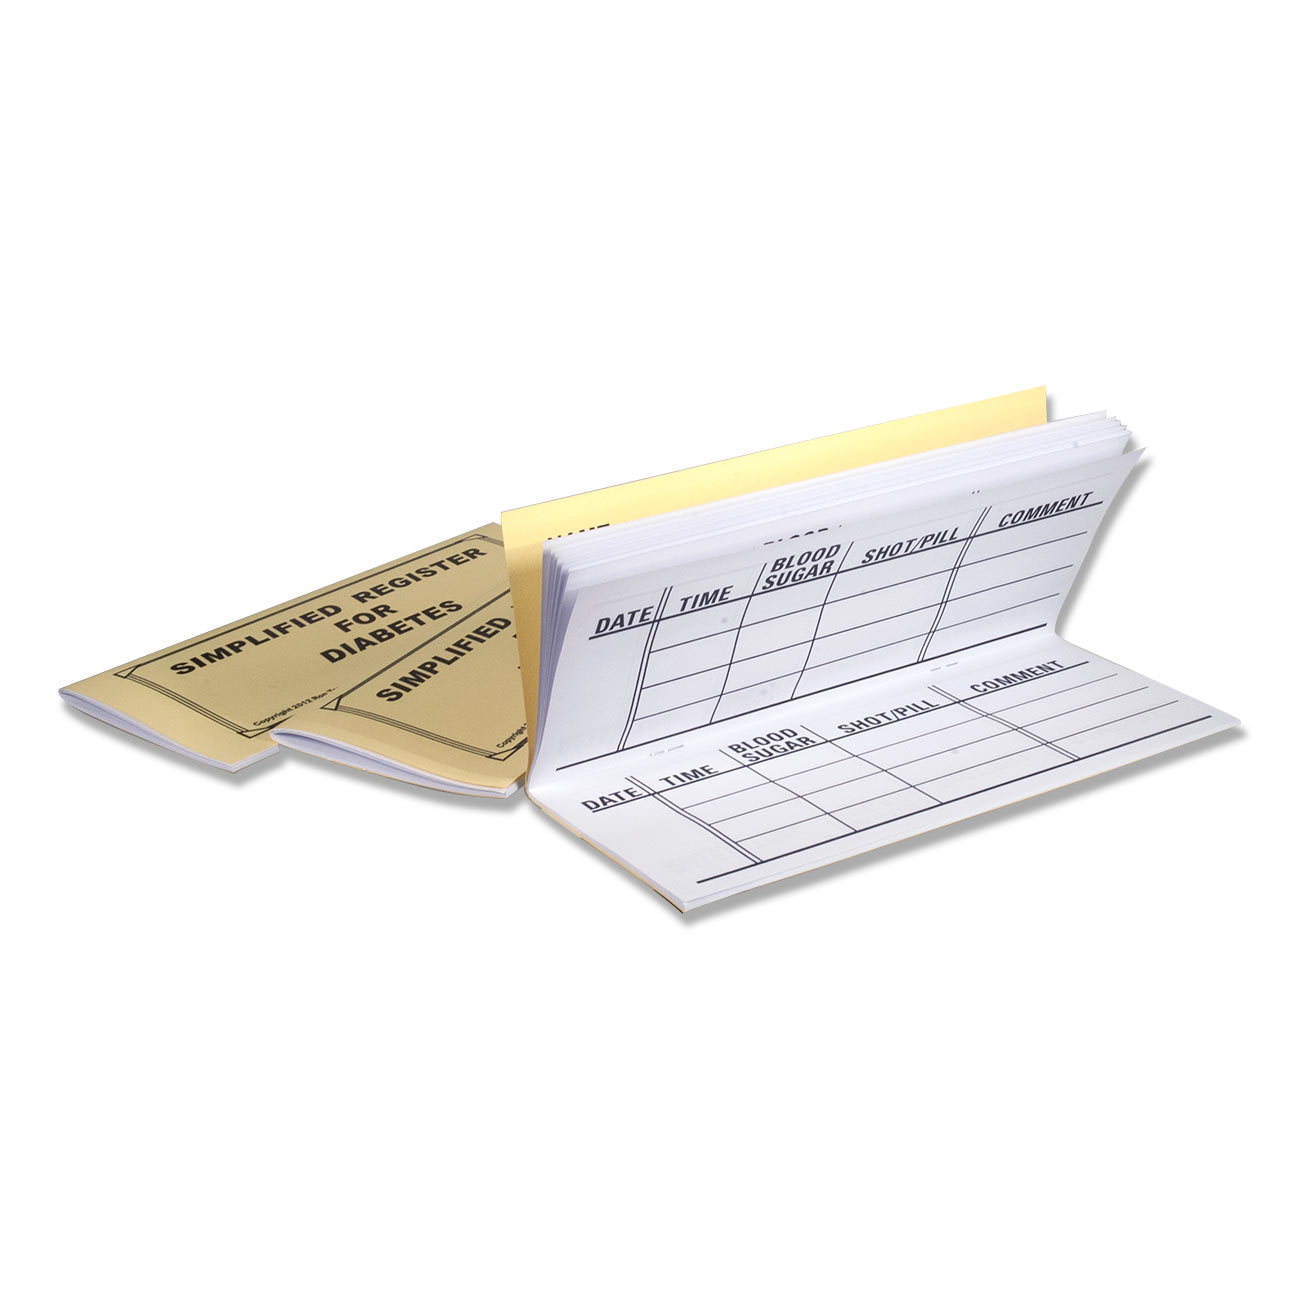 Large Print Register for Diabetes